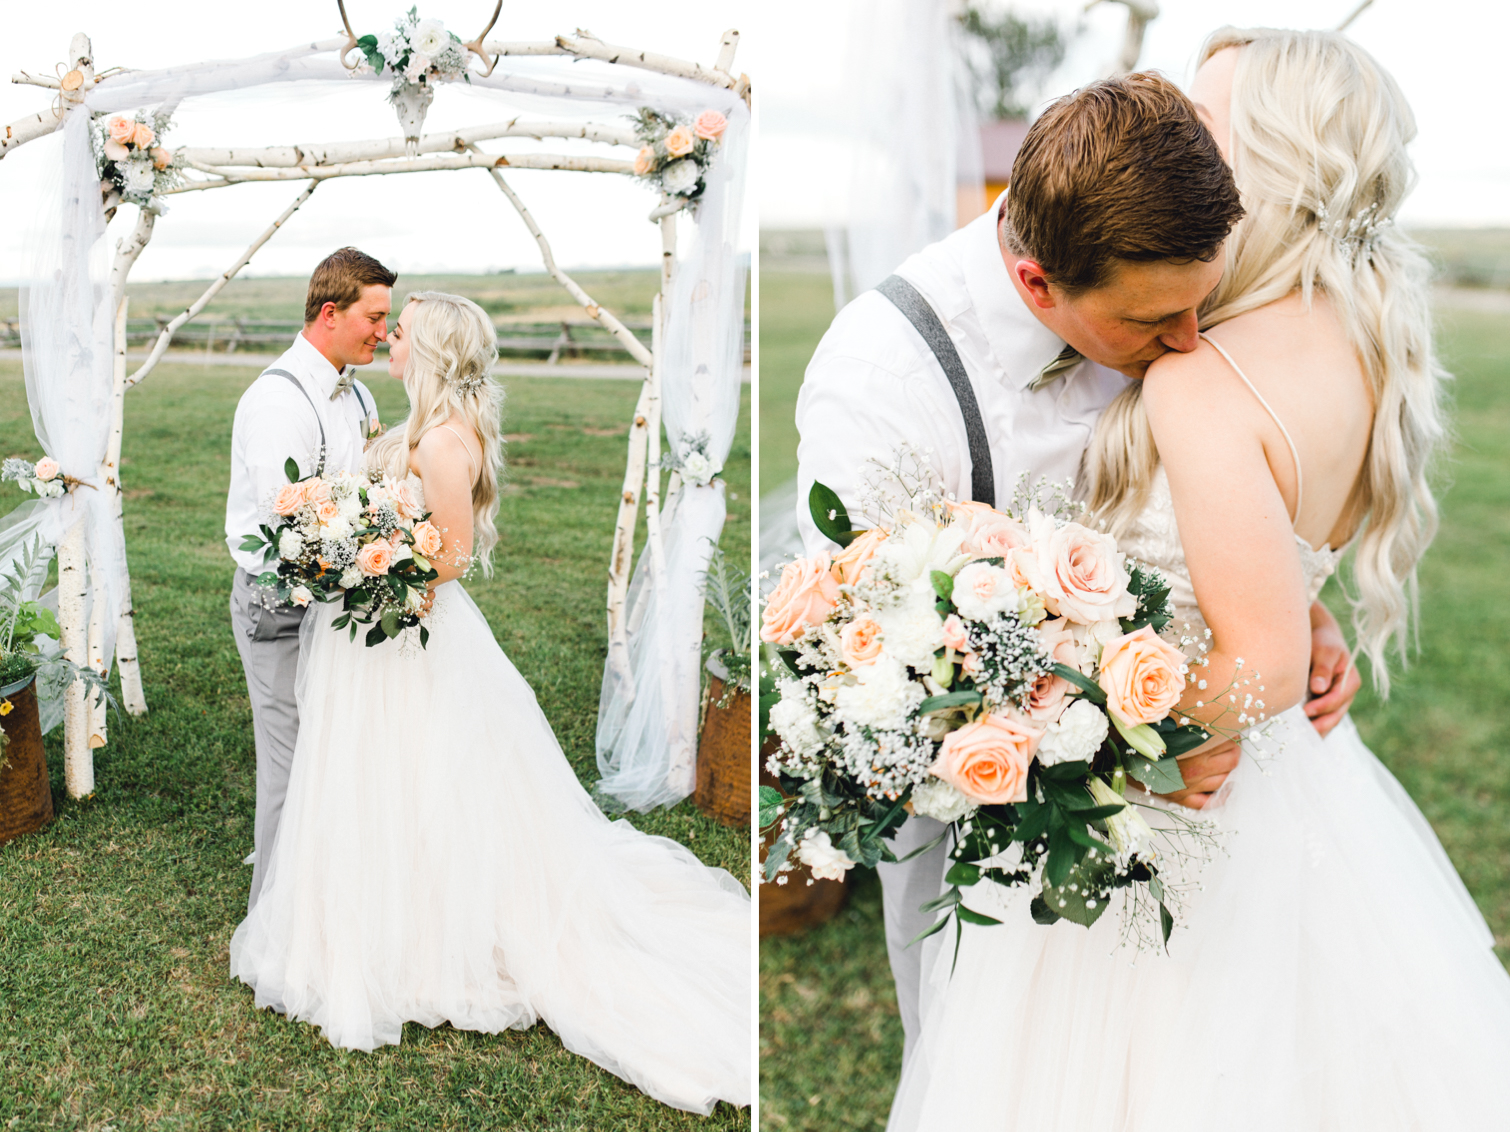 country-outdoor-rustic-wedding-tetons-idaho-anna-christine-photo-4.jpg